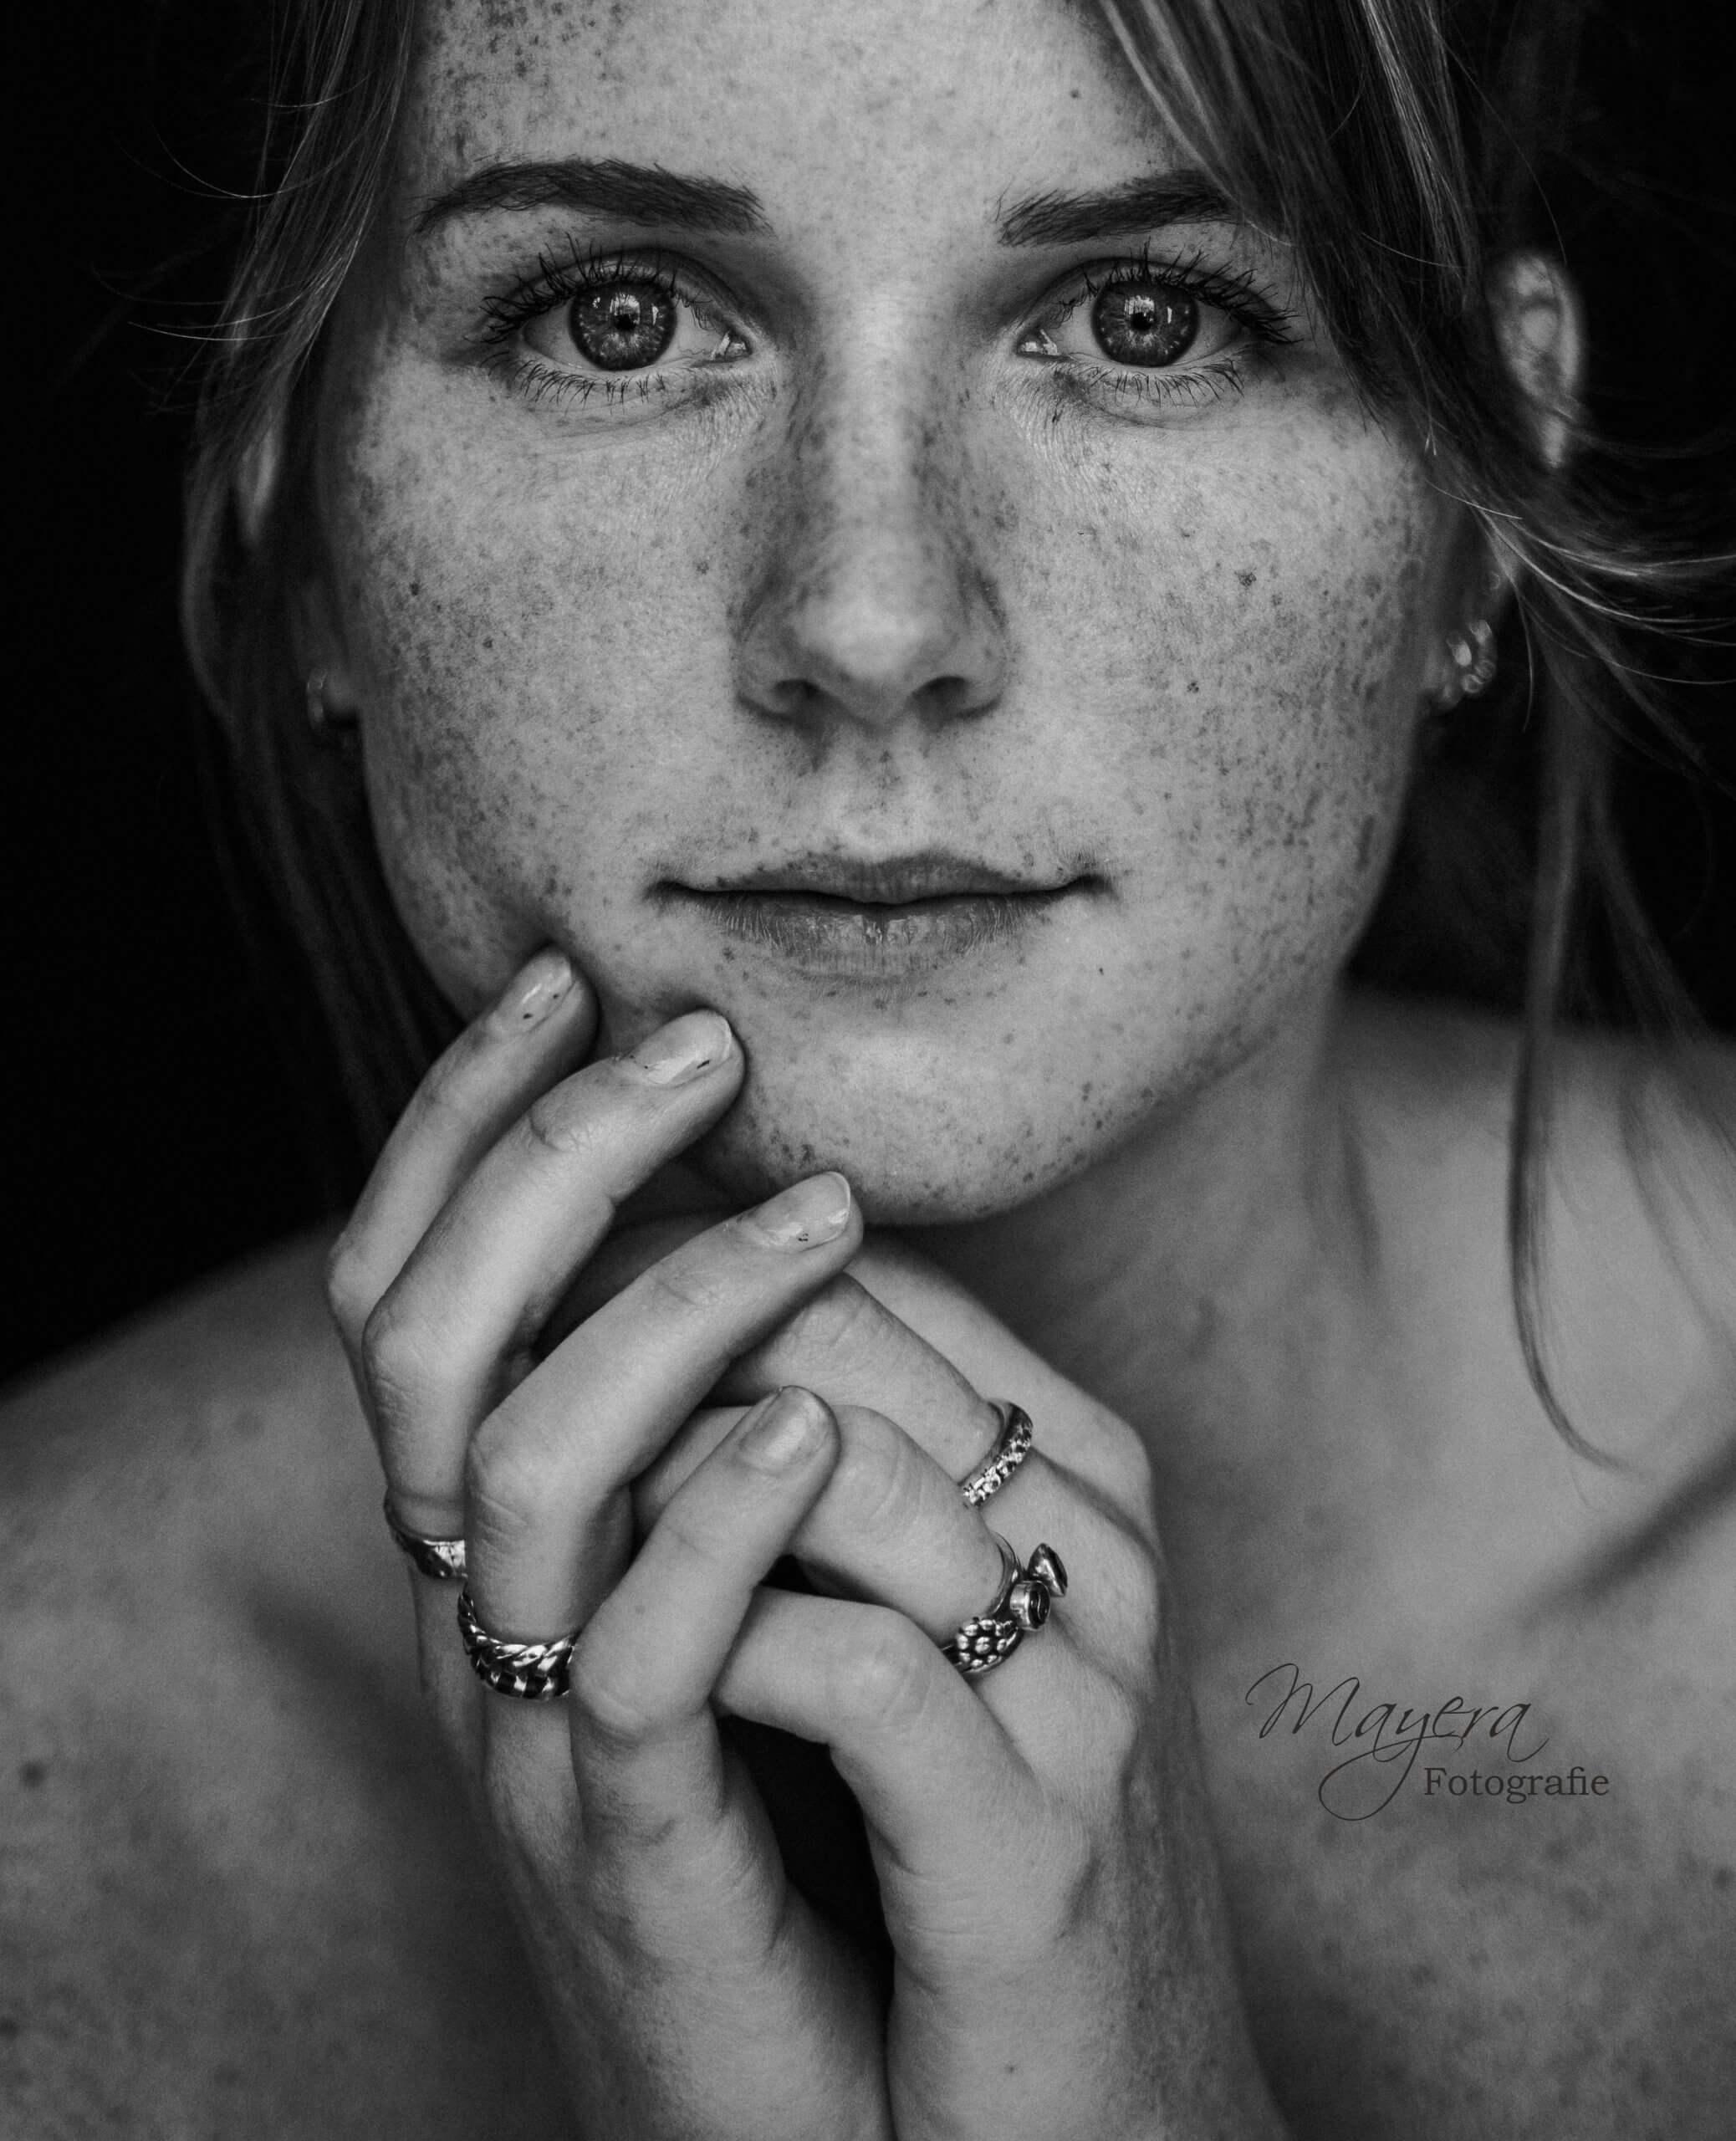 zwart-wit-portret-meisje-fotoshoot-photoshoot-wijk-bij-duurstede-scaled